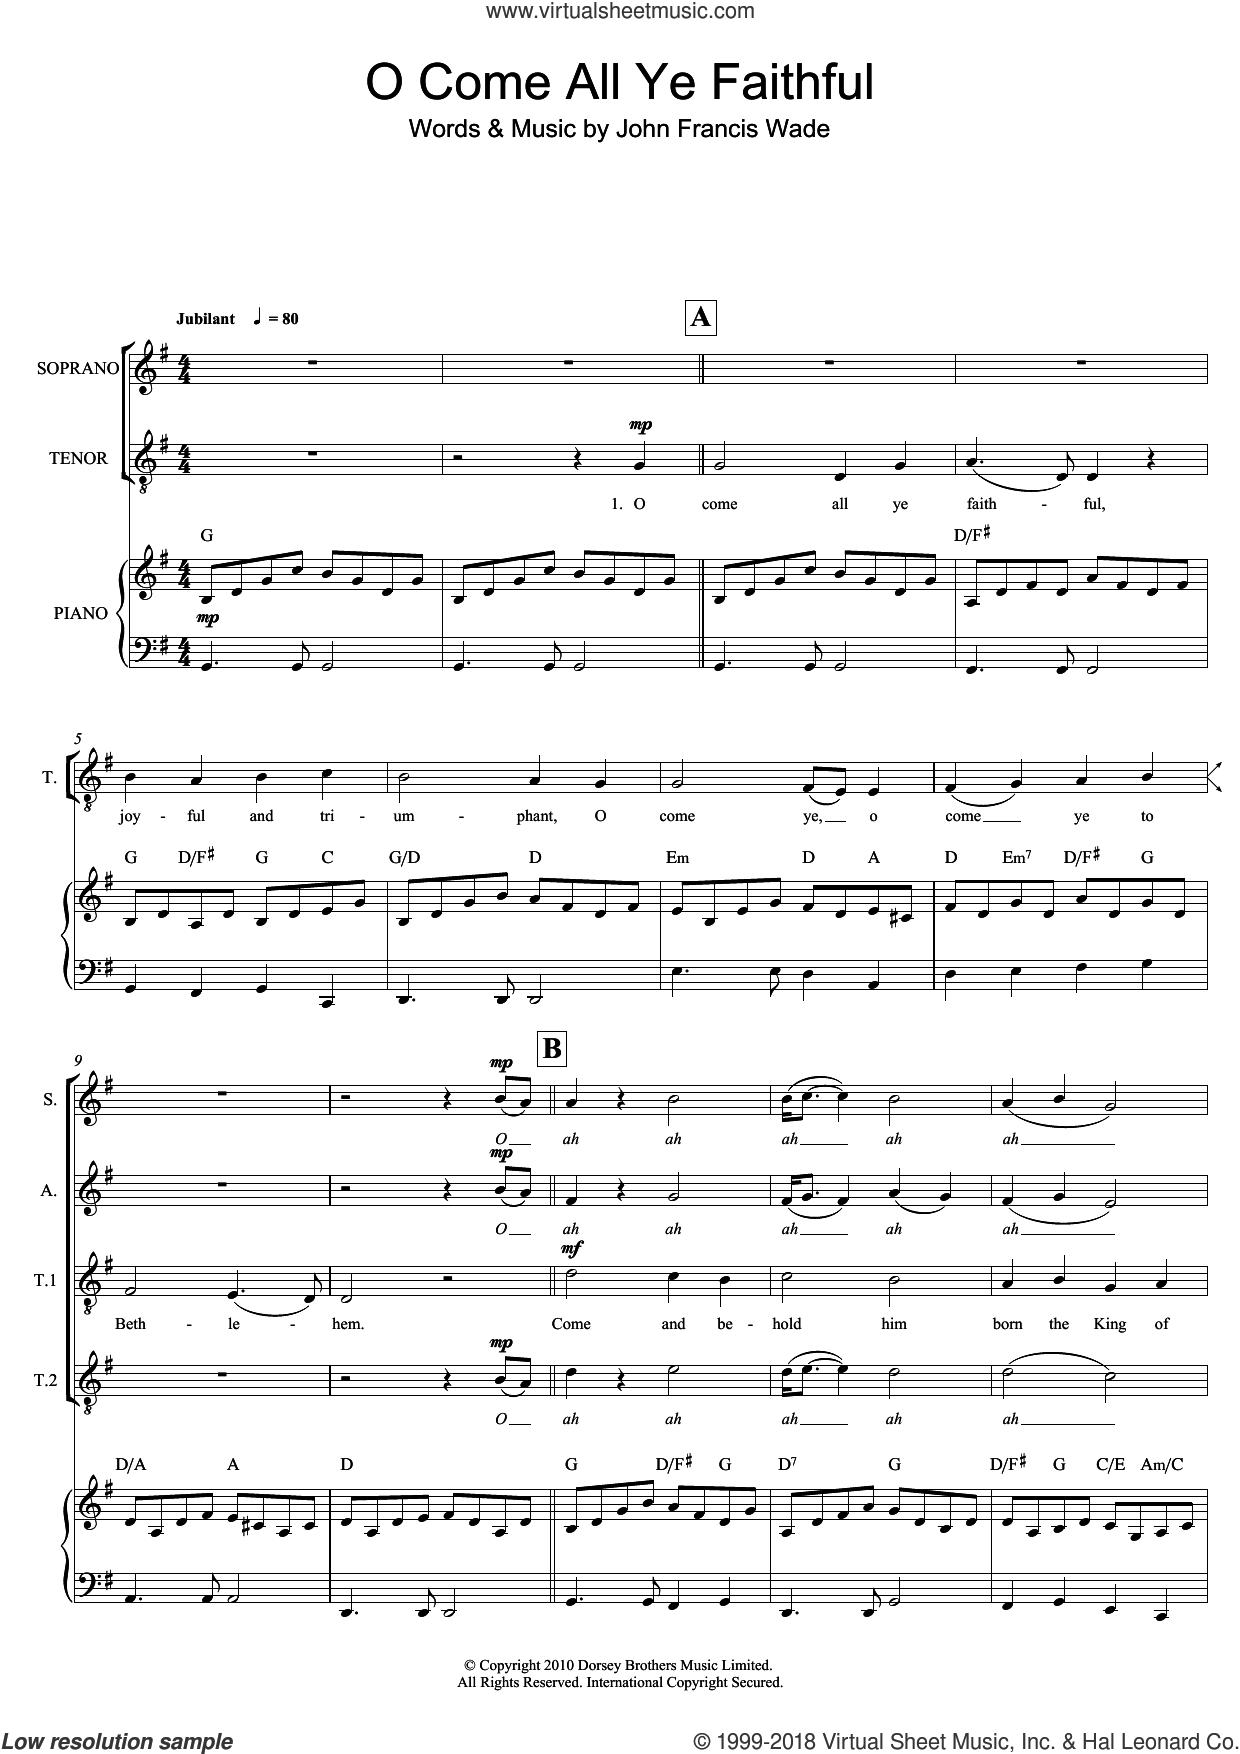 O Come All Ye Faithful sheet music for choir (SAT: soprano, alto, tenor) by John Francis Wade, Mark De-Lisser and Miscellaneous, intermediate skill level